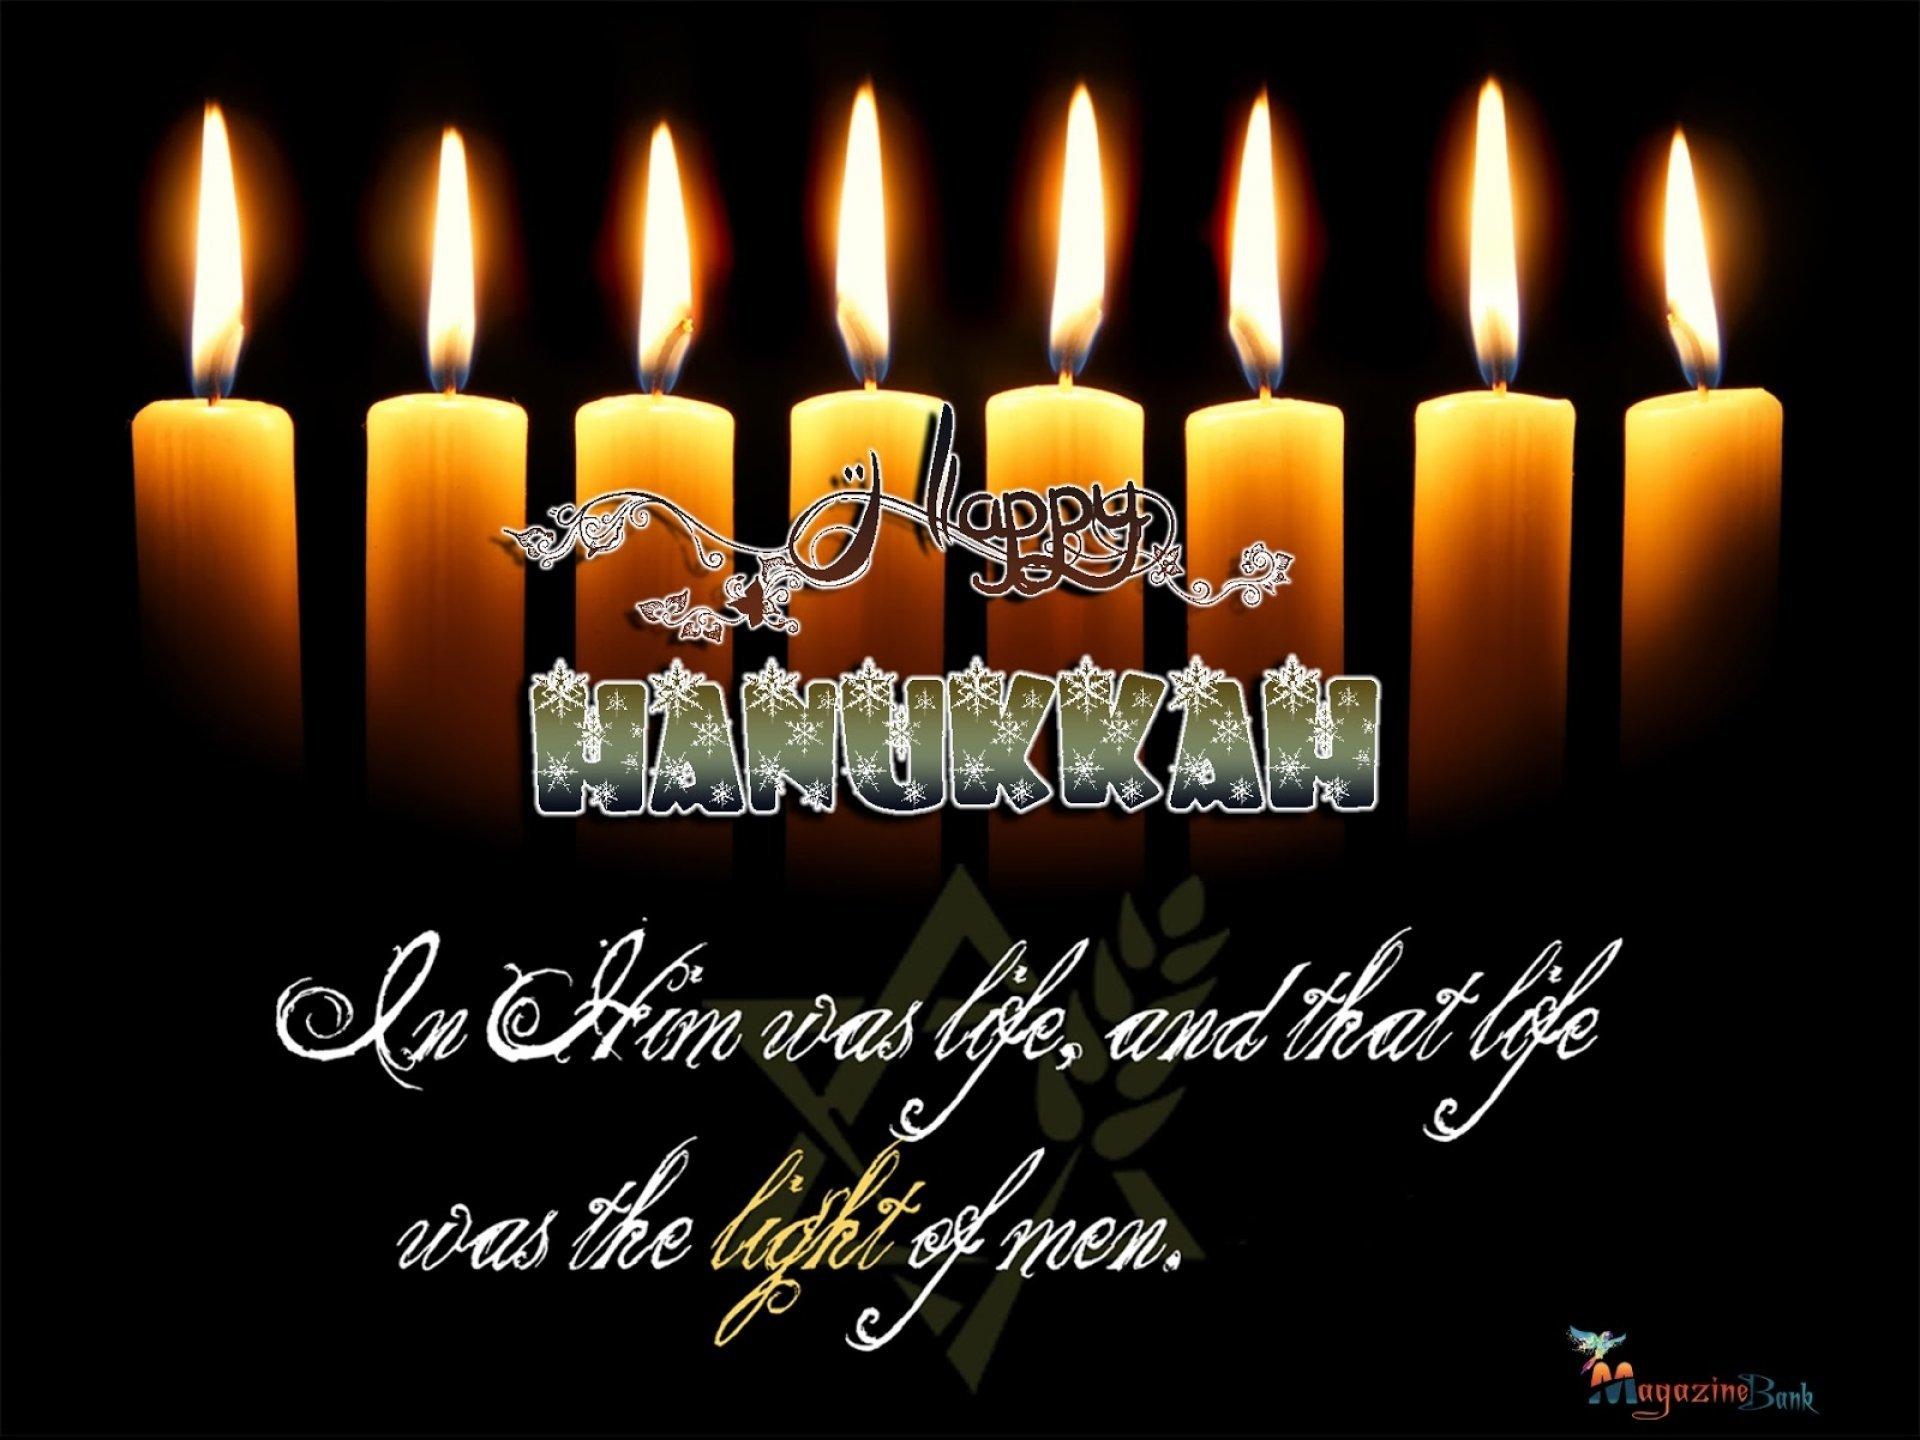 Download Hd 1920x1440 Hanukkah Computer Wallpaper ID356949 For Free